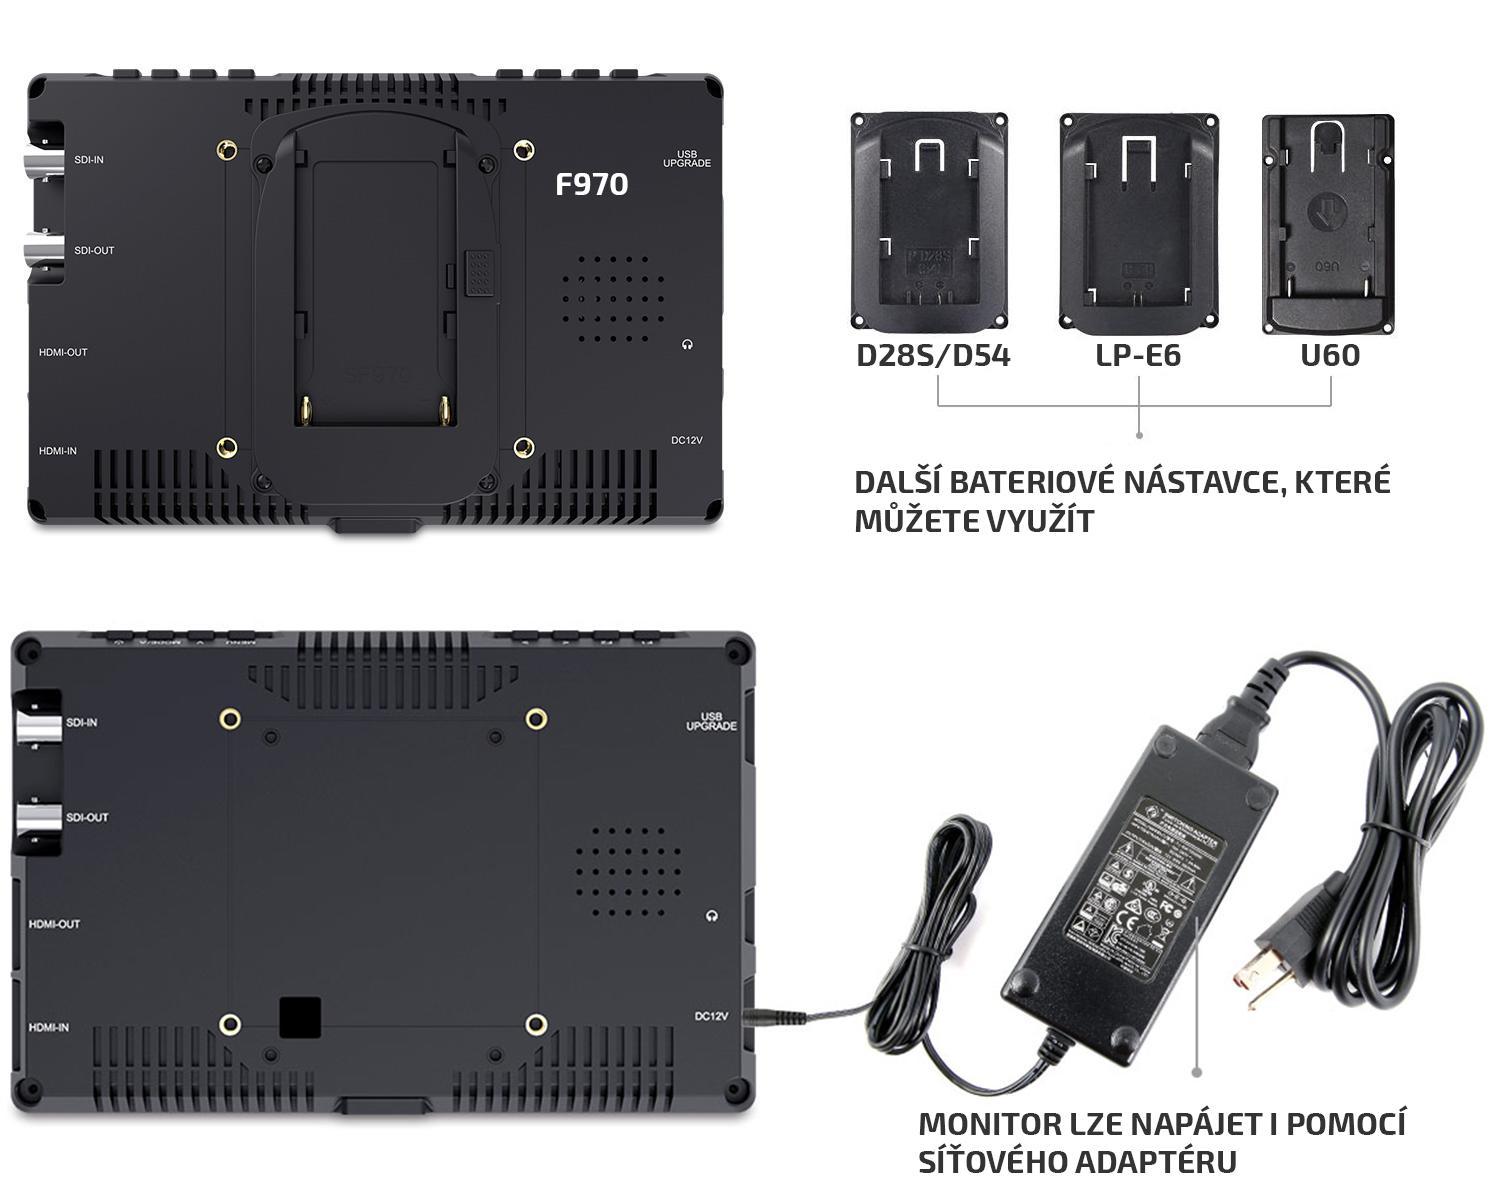 dslr-monitor-mount